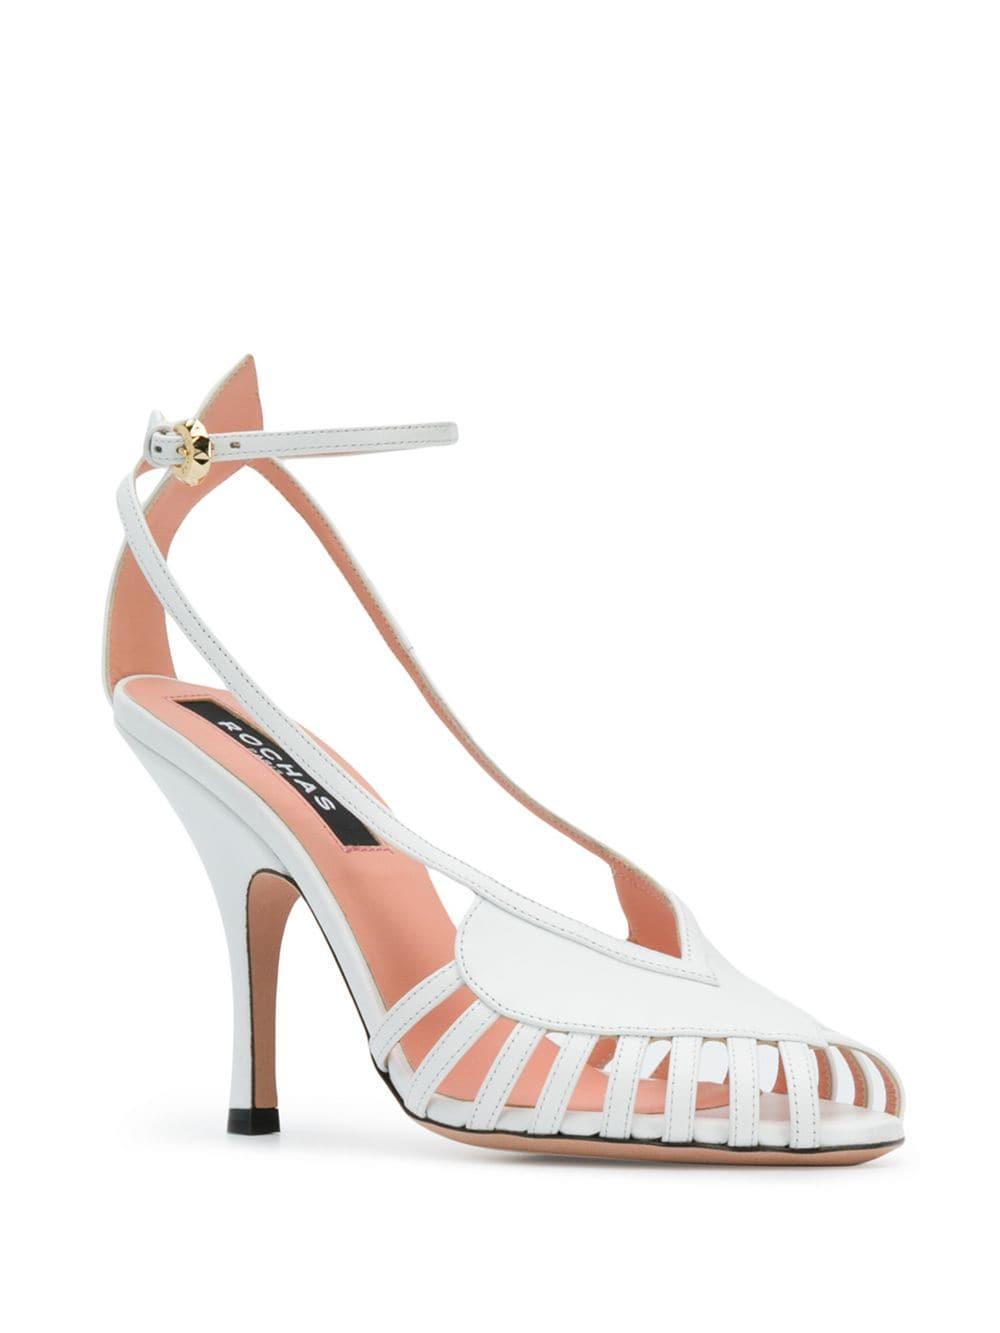 c2dedf611276 Rochas - White Cut-out Sandals - Lyst. View fullscreen